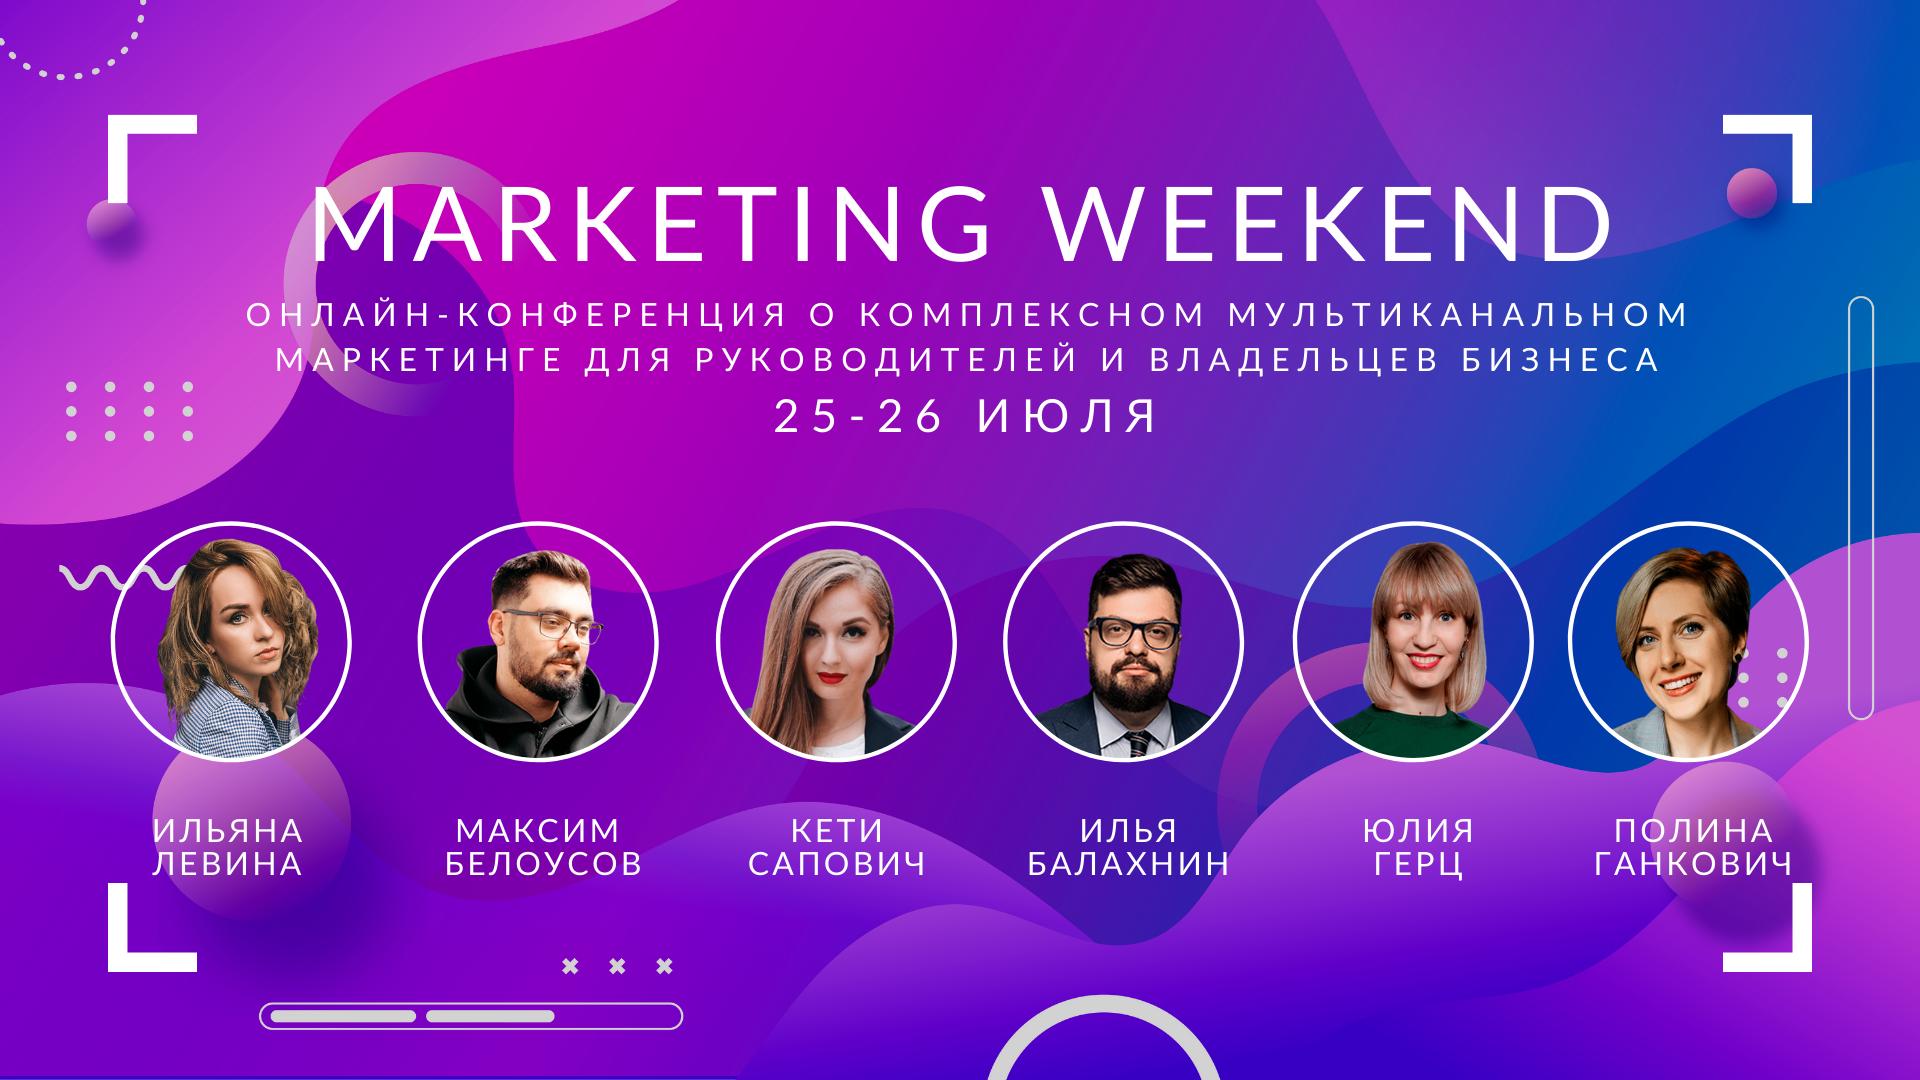 Marketing Weekend 1.0